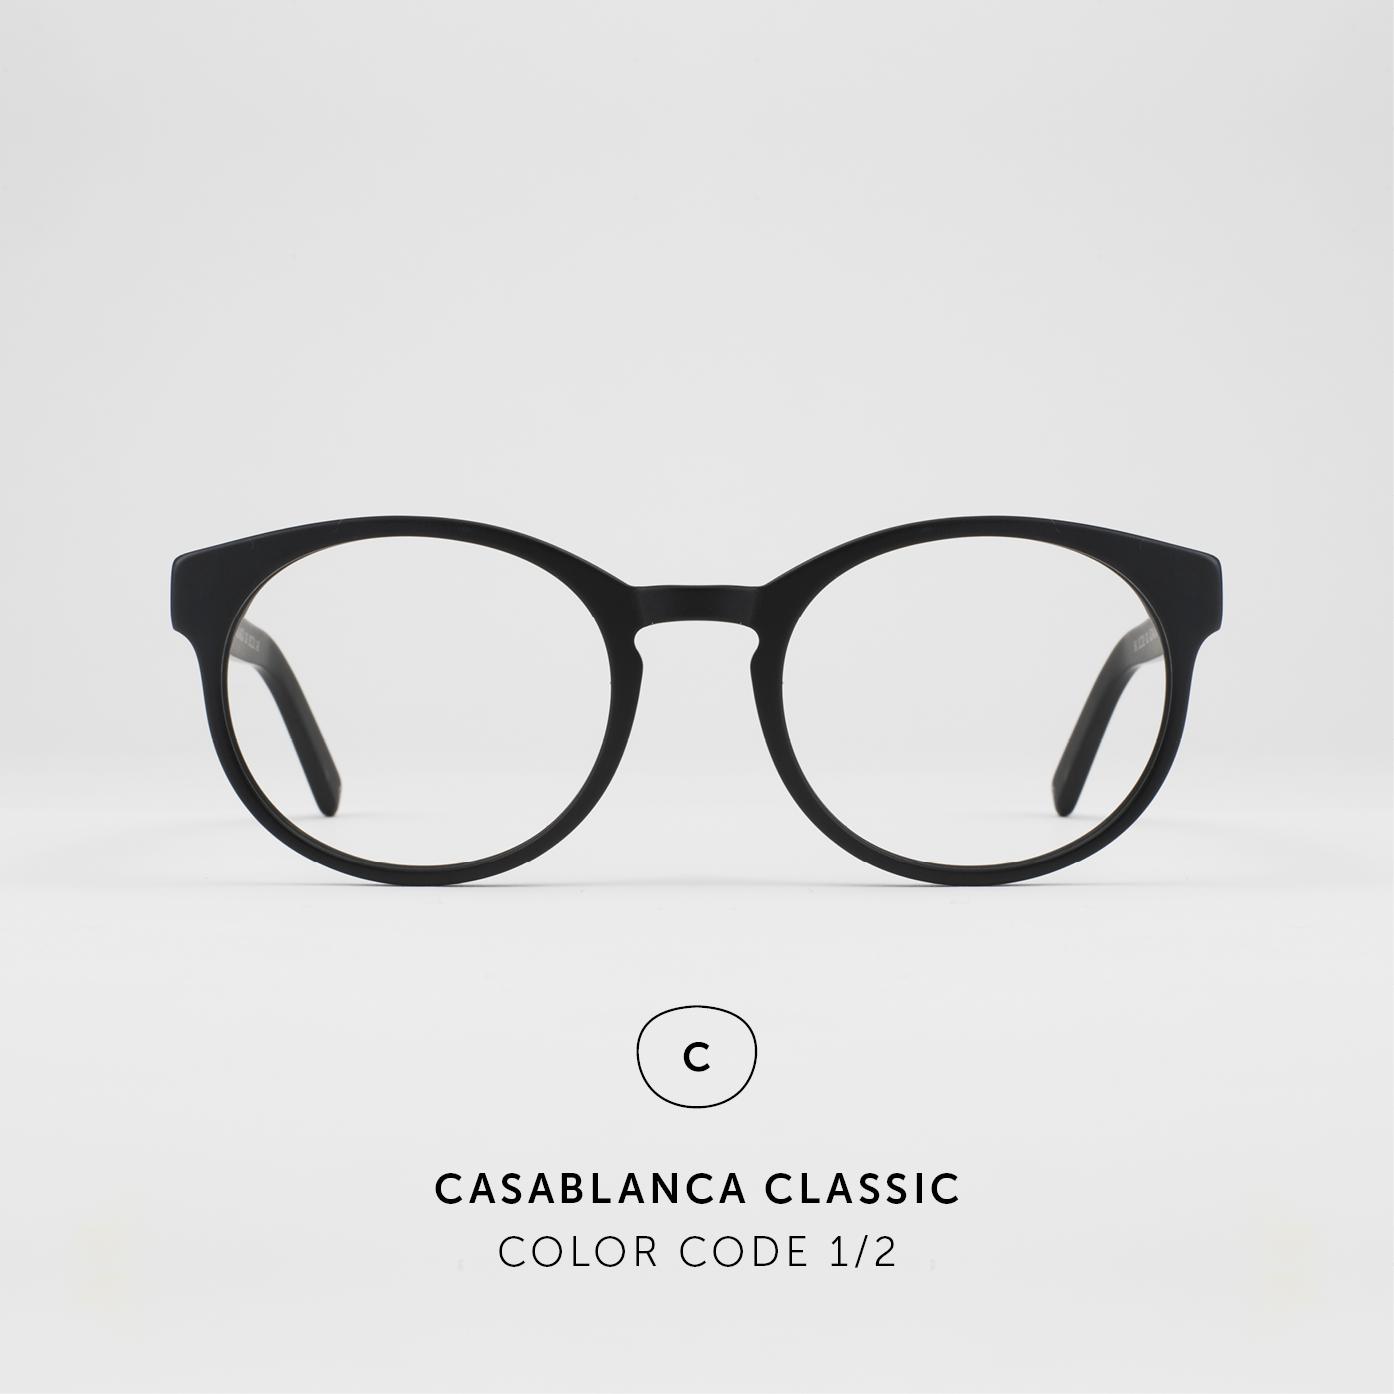 CasablancaClassic5.jpg